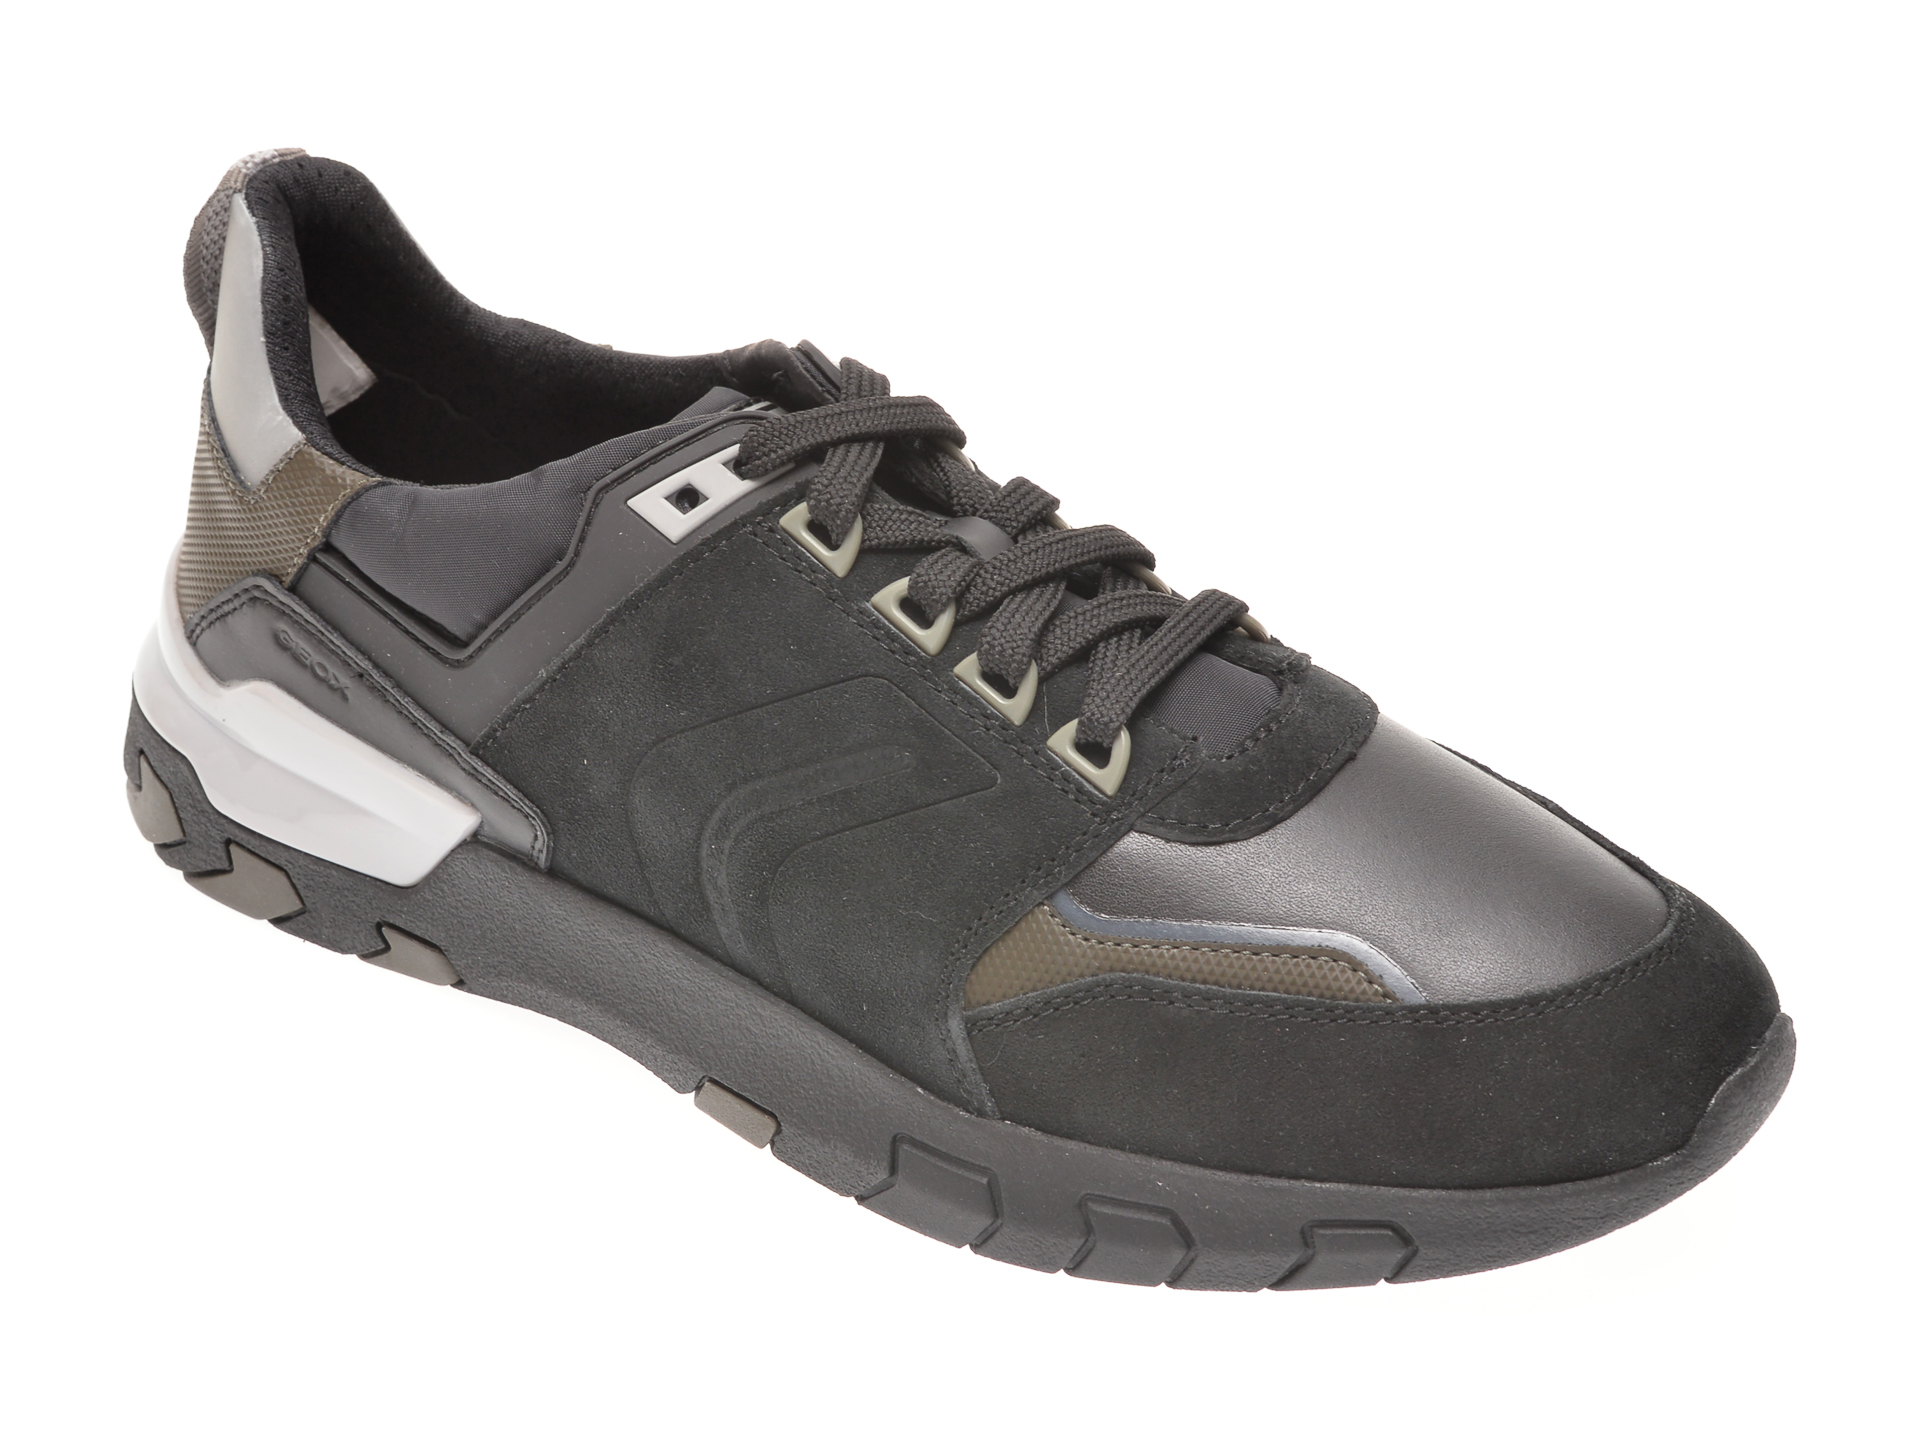 Pantofi sport GEOX negri, U048ZA, din piele intoarsa imagine